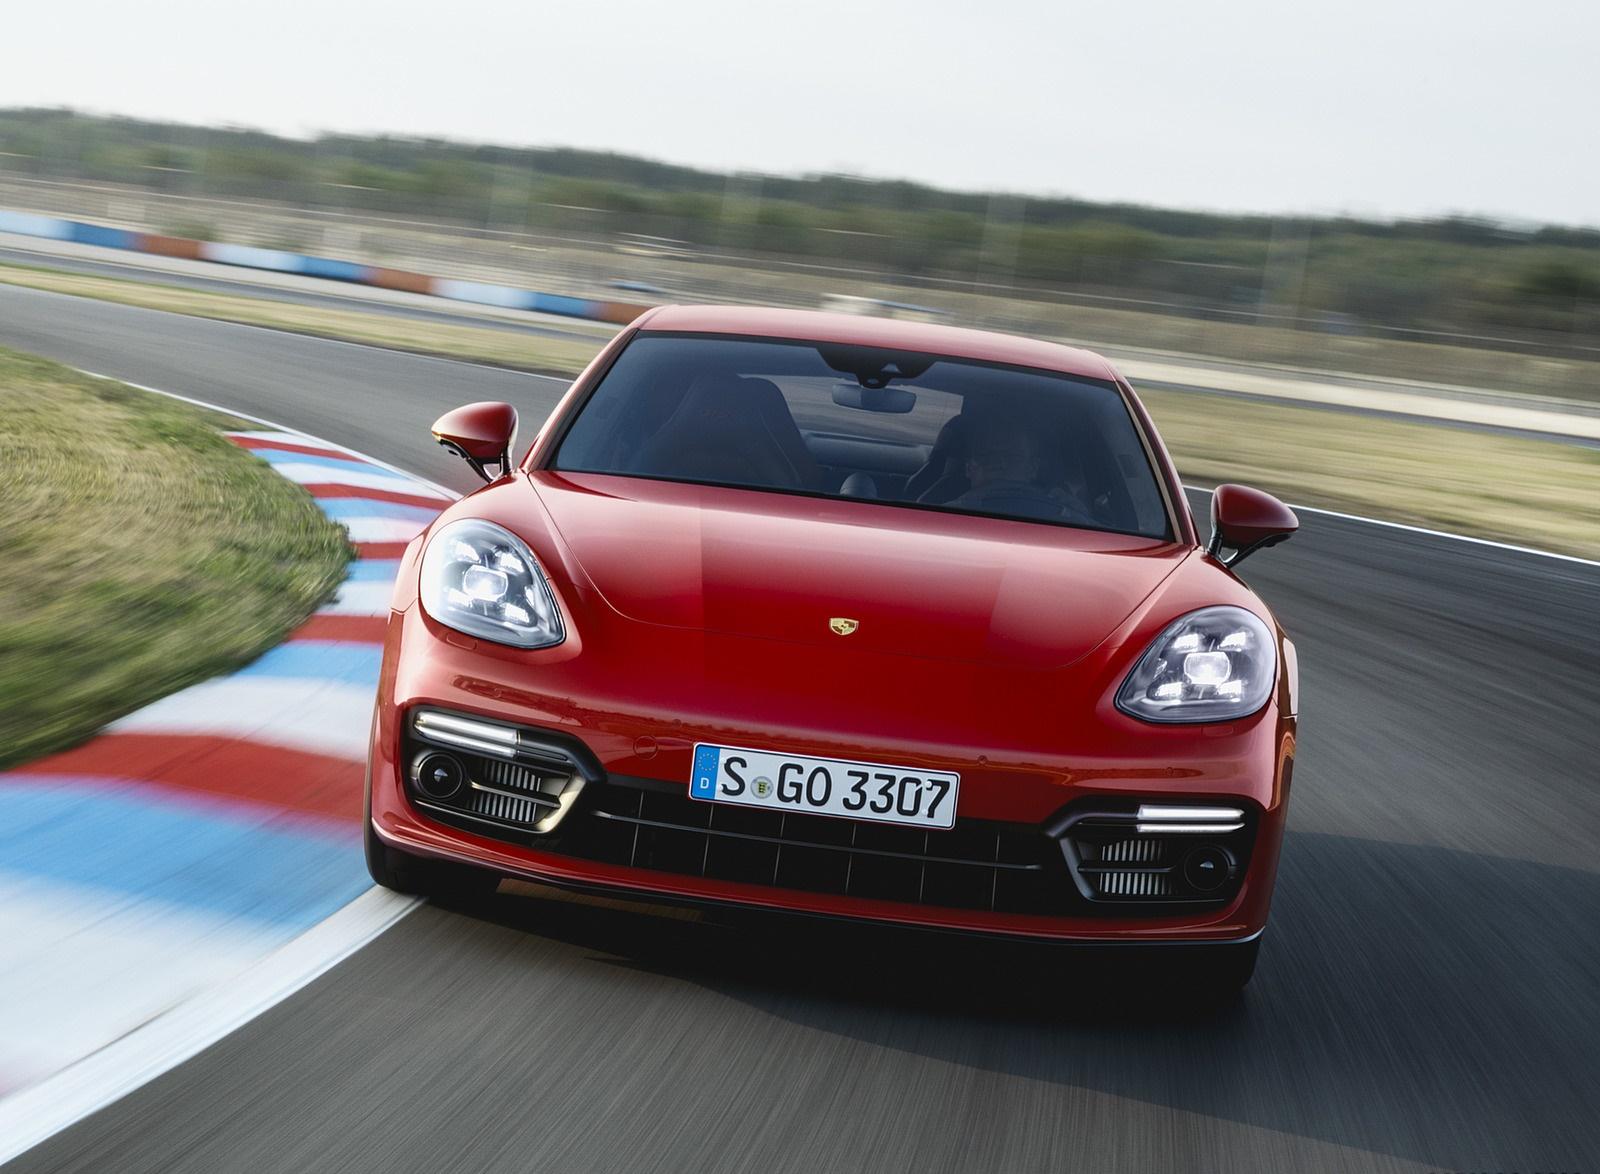 2019 Porsche Panamera GTS (Color: Carmine Red) Front Wallpaper (4)